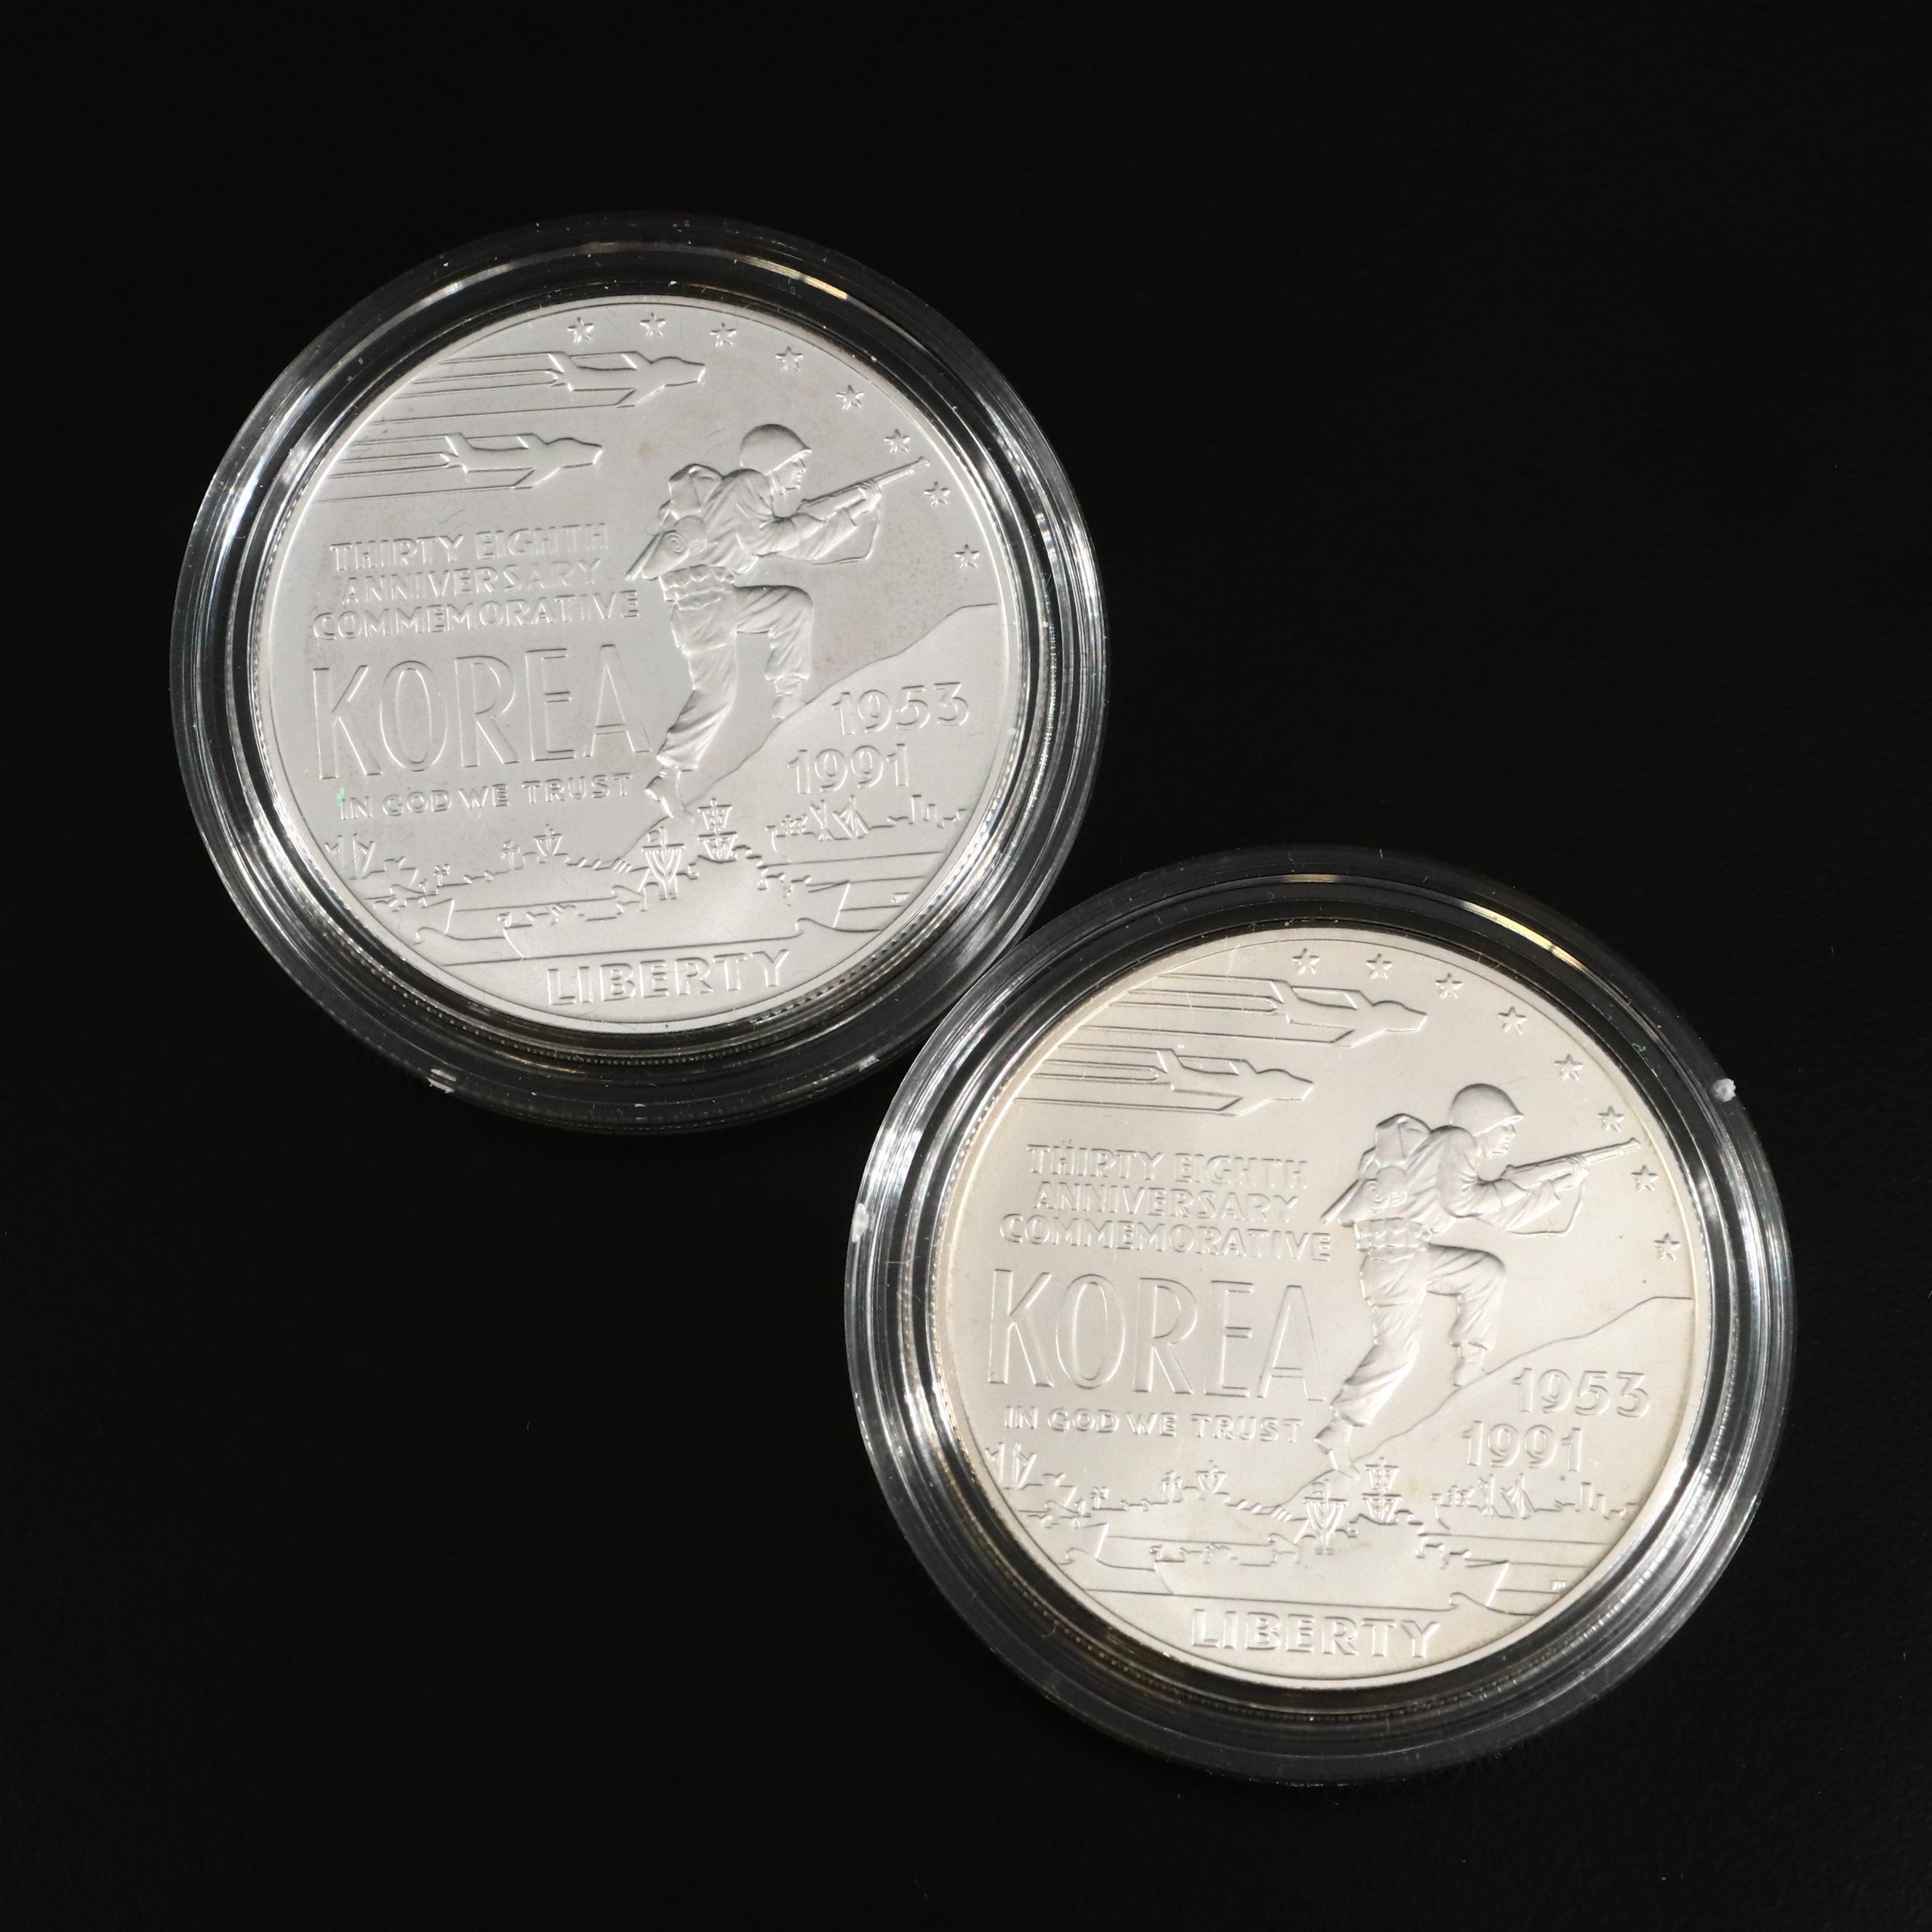 1991-D Korean War Commemorative Silver Dollar Mint State